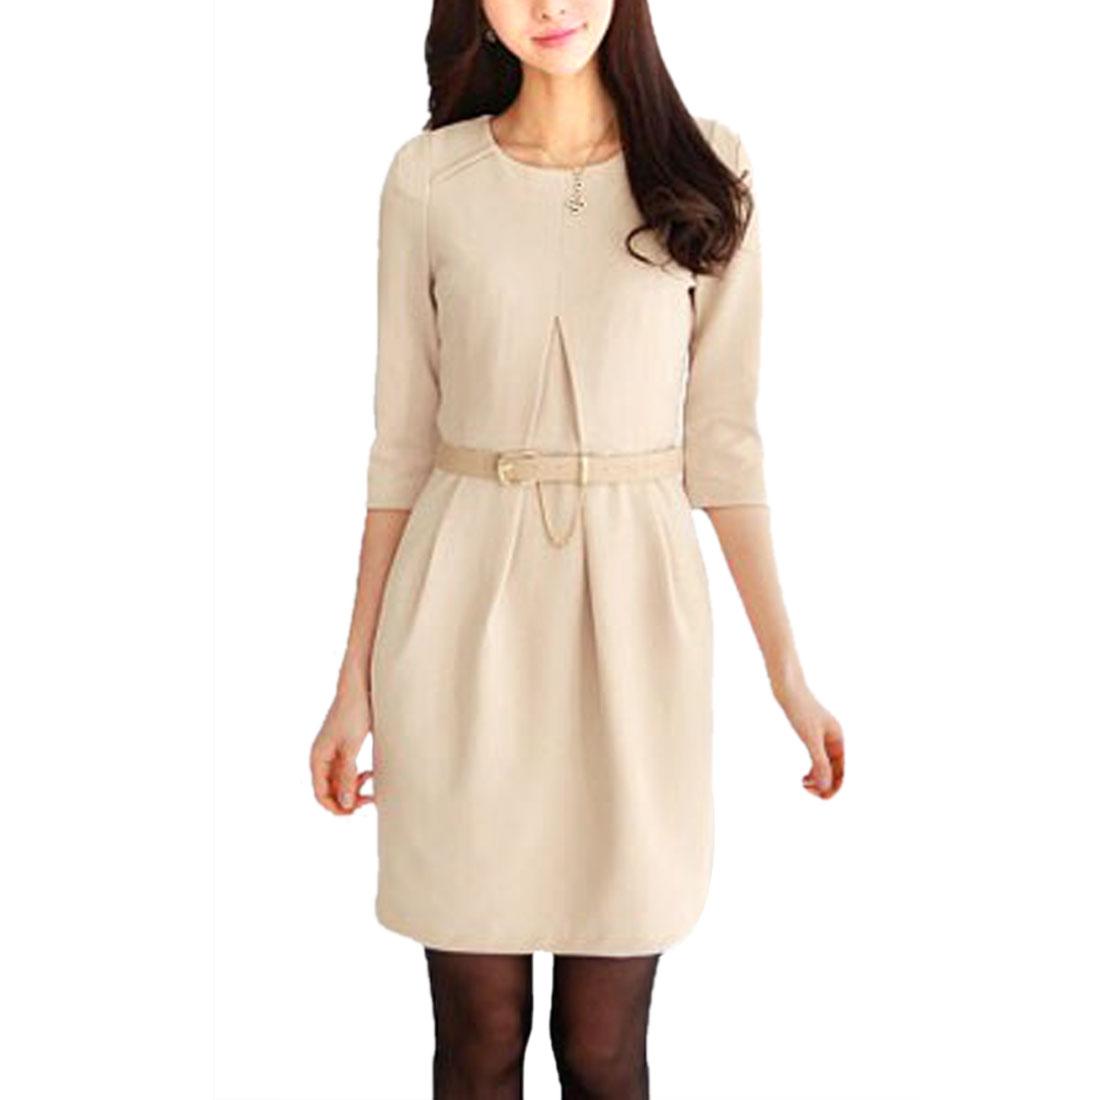 Ladies Apricot Scoop Neck Pullover With waist Belt Mini Dress XS